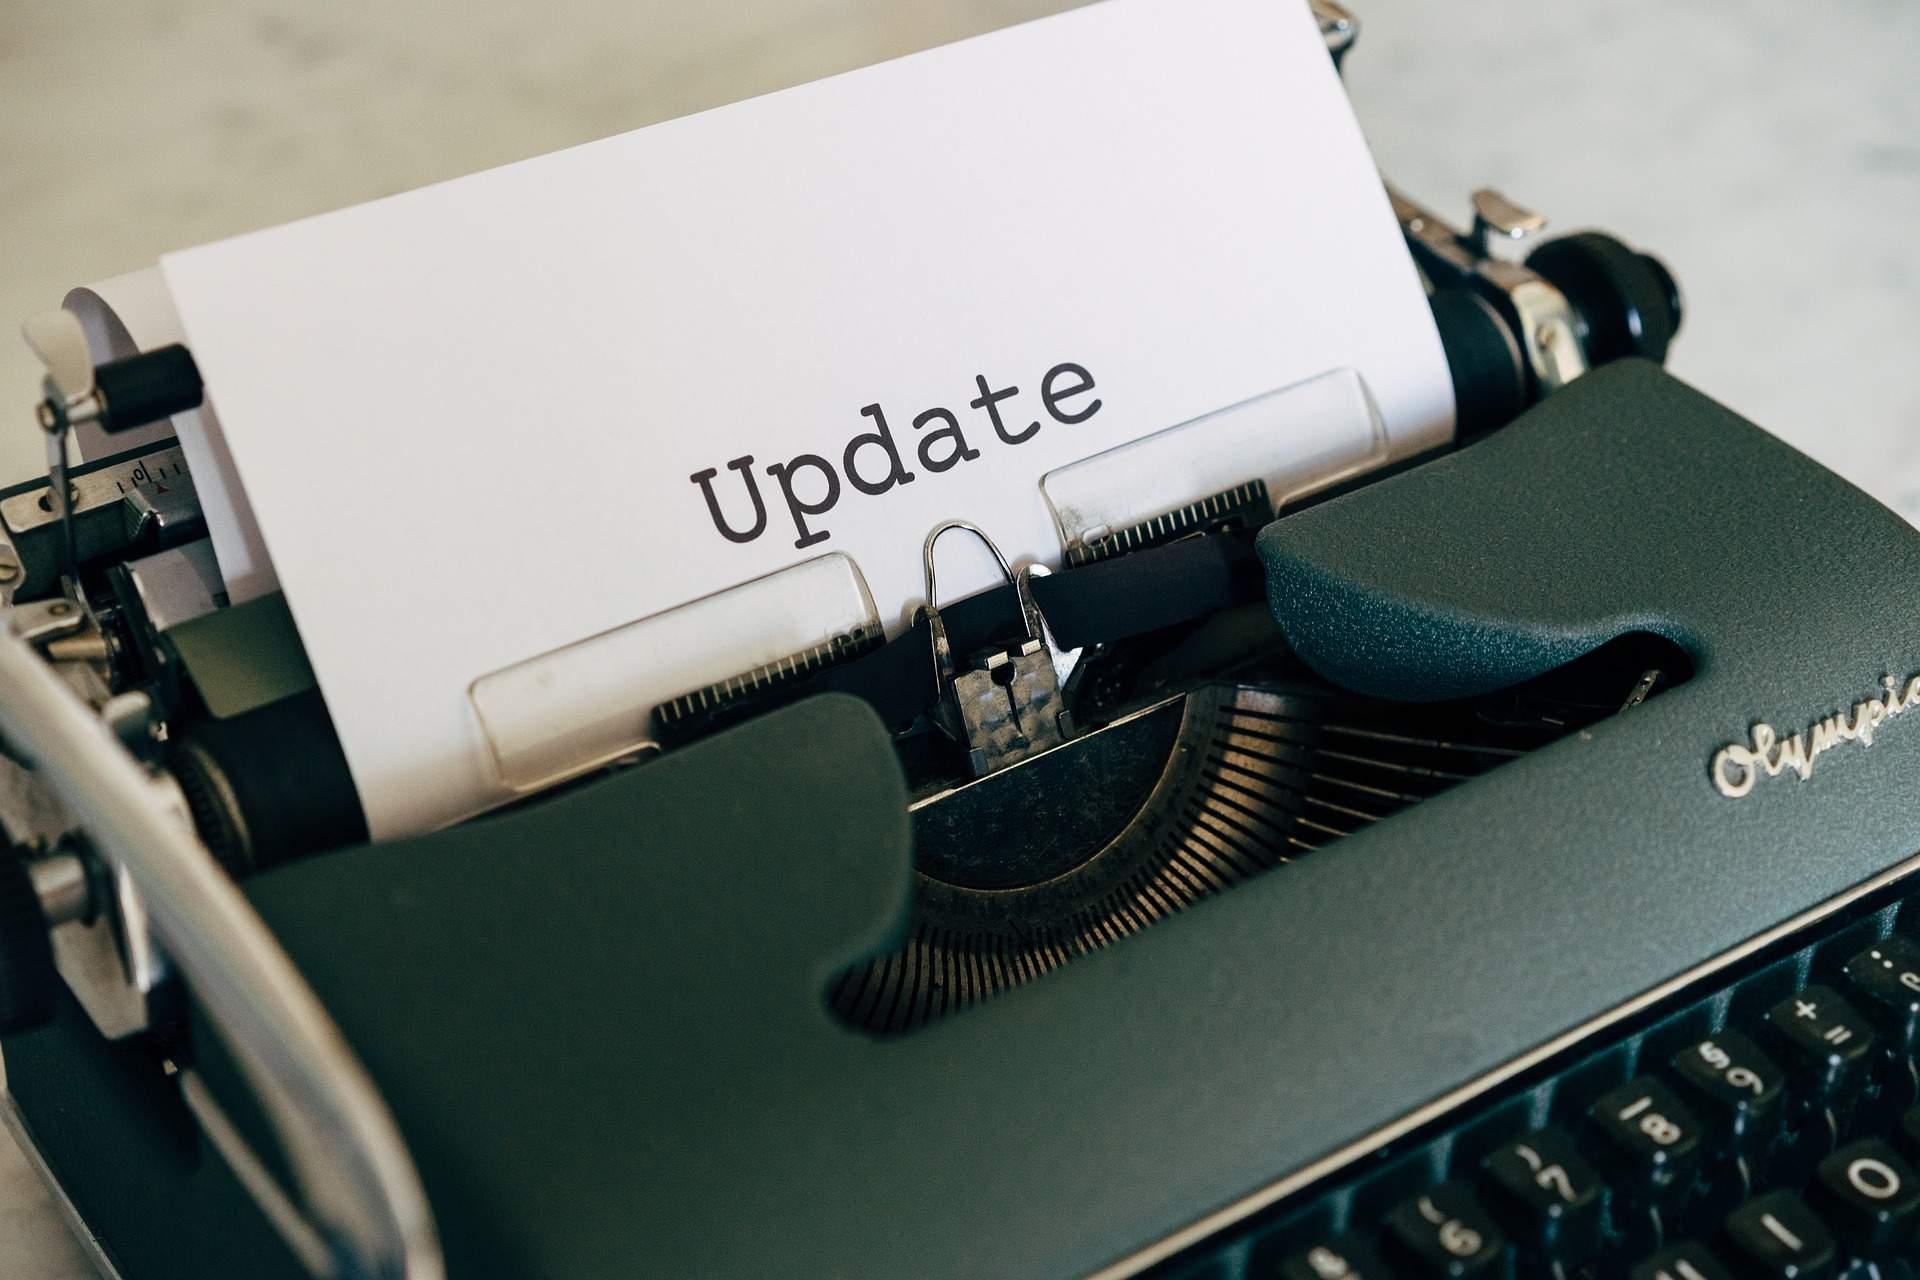 Up-to-date market appraisals